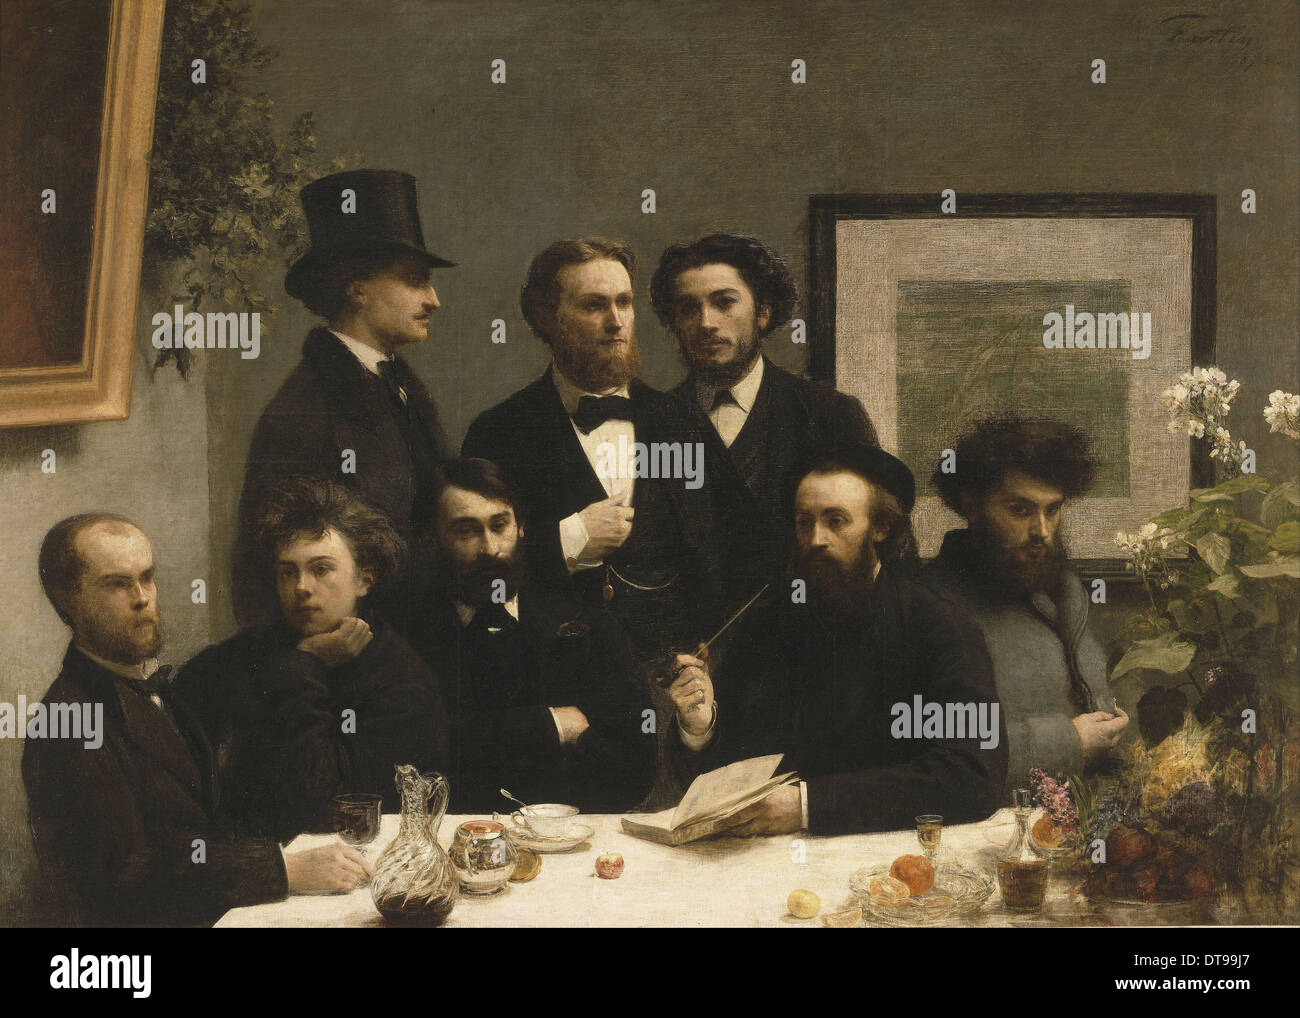 By the Table, 1872. Artist: Fantin-Latour, Henri (1836-1904) - Stock Image